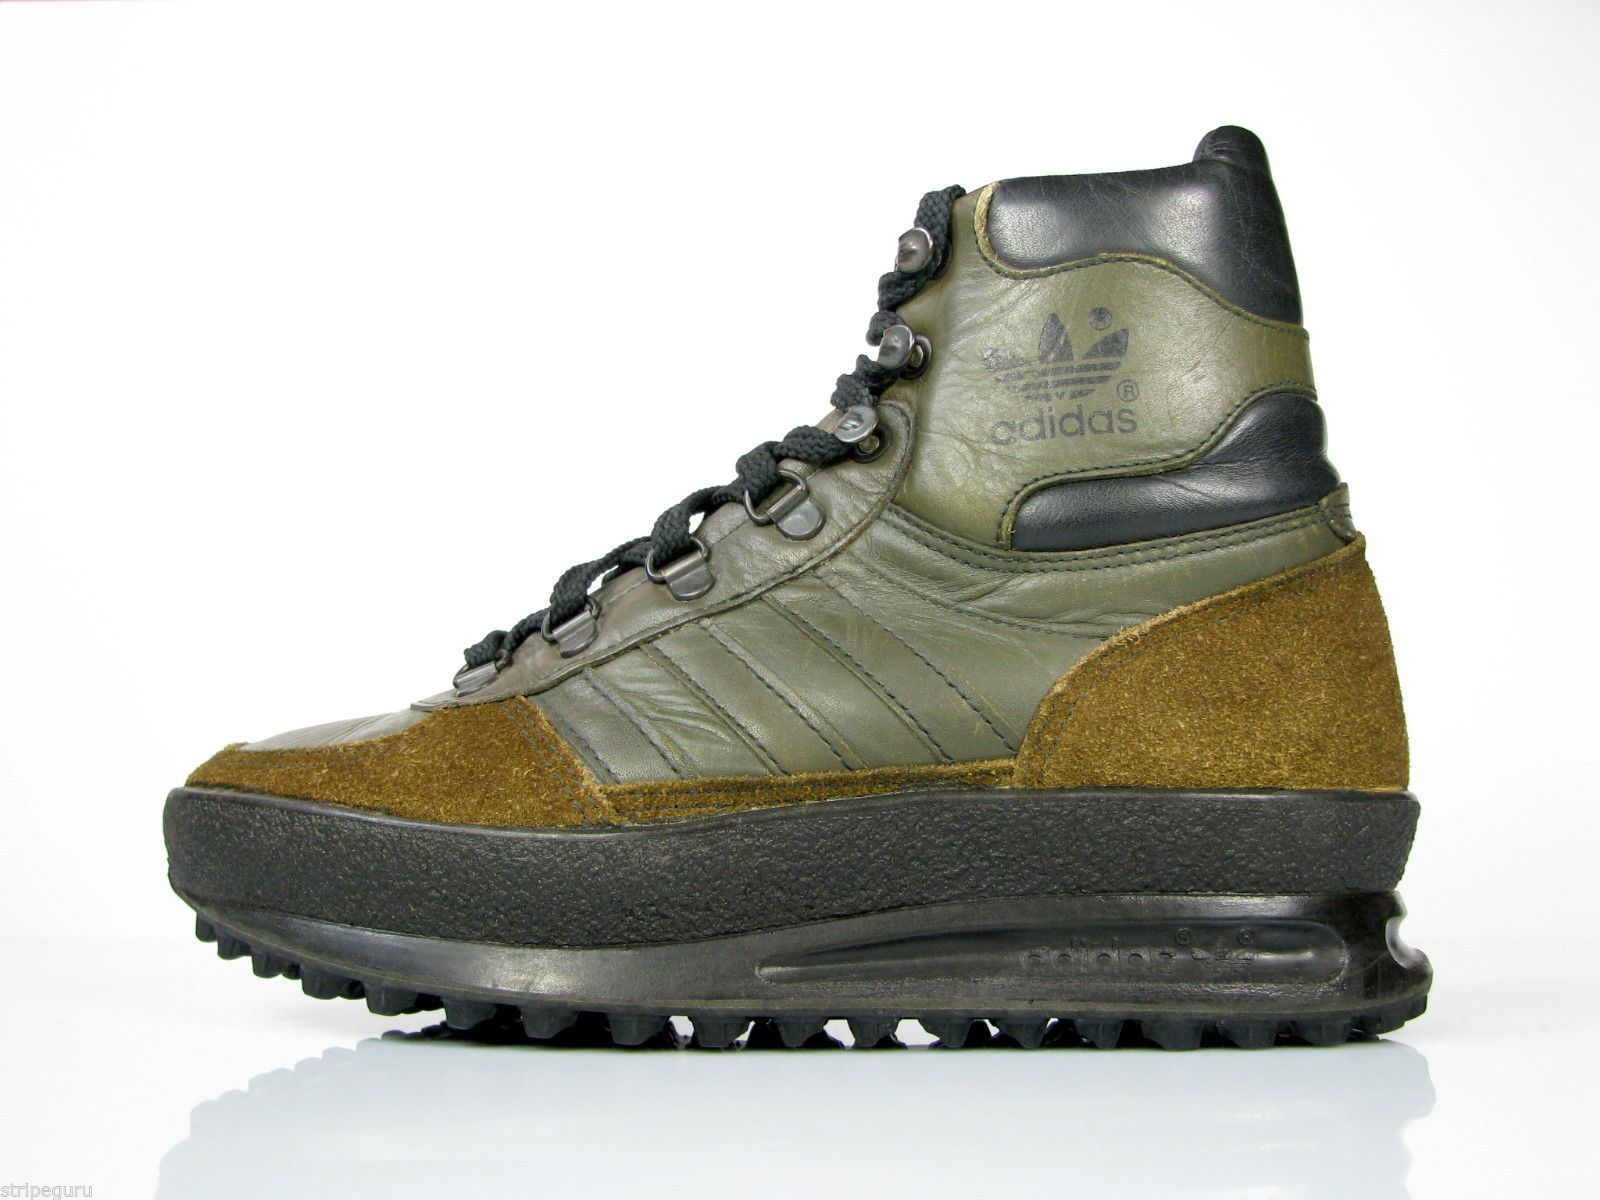 Vintage Adidas Trekking Hiking Outdoor Boots Womens UK 5 5 RARE 80s OG  YUGOSLAV  ee1c5a2c45